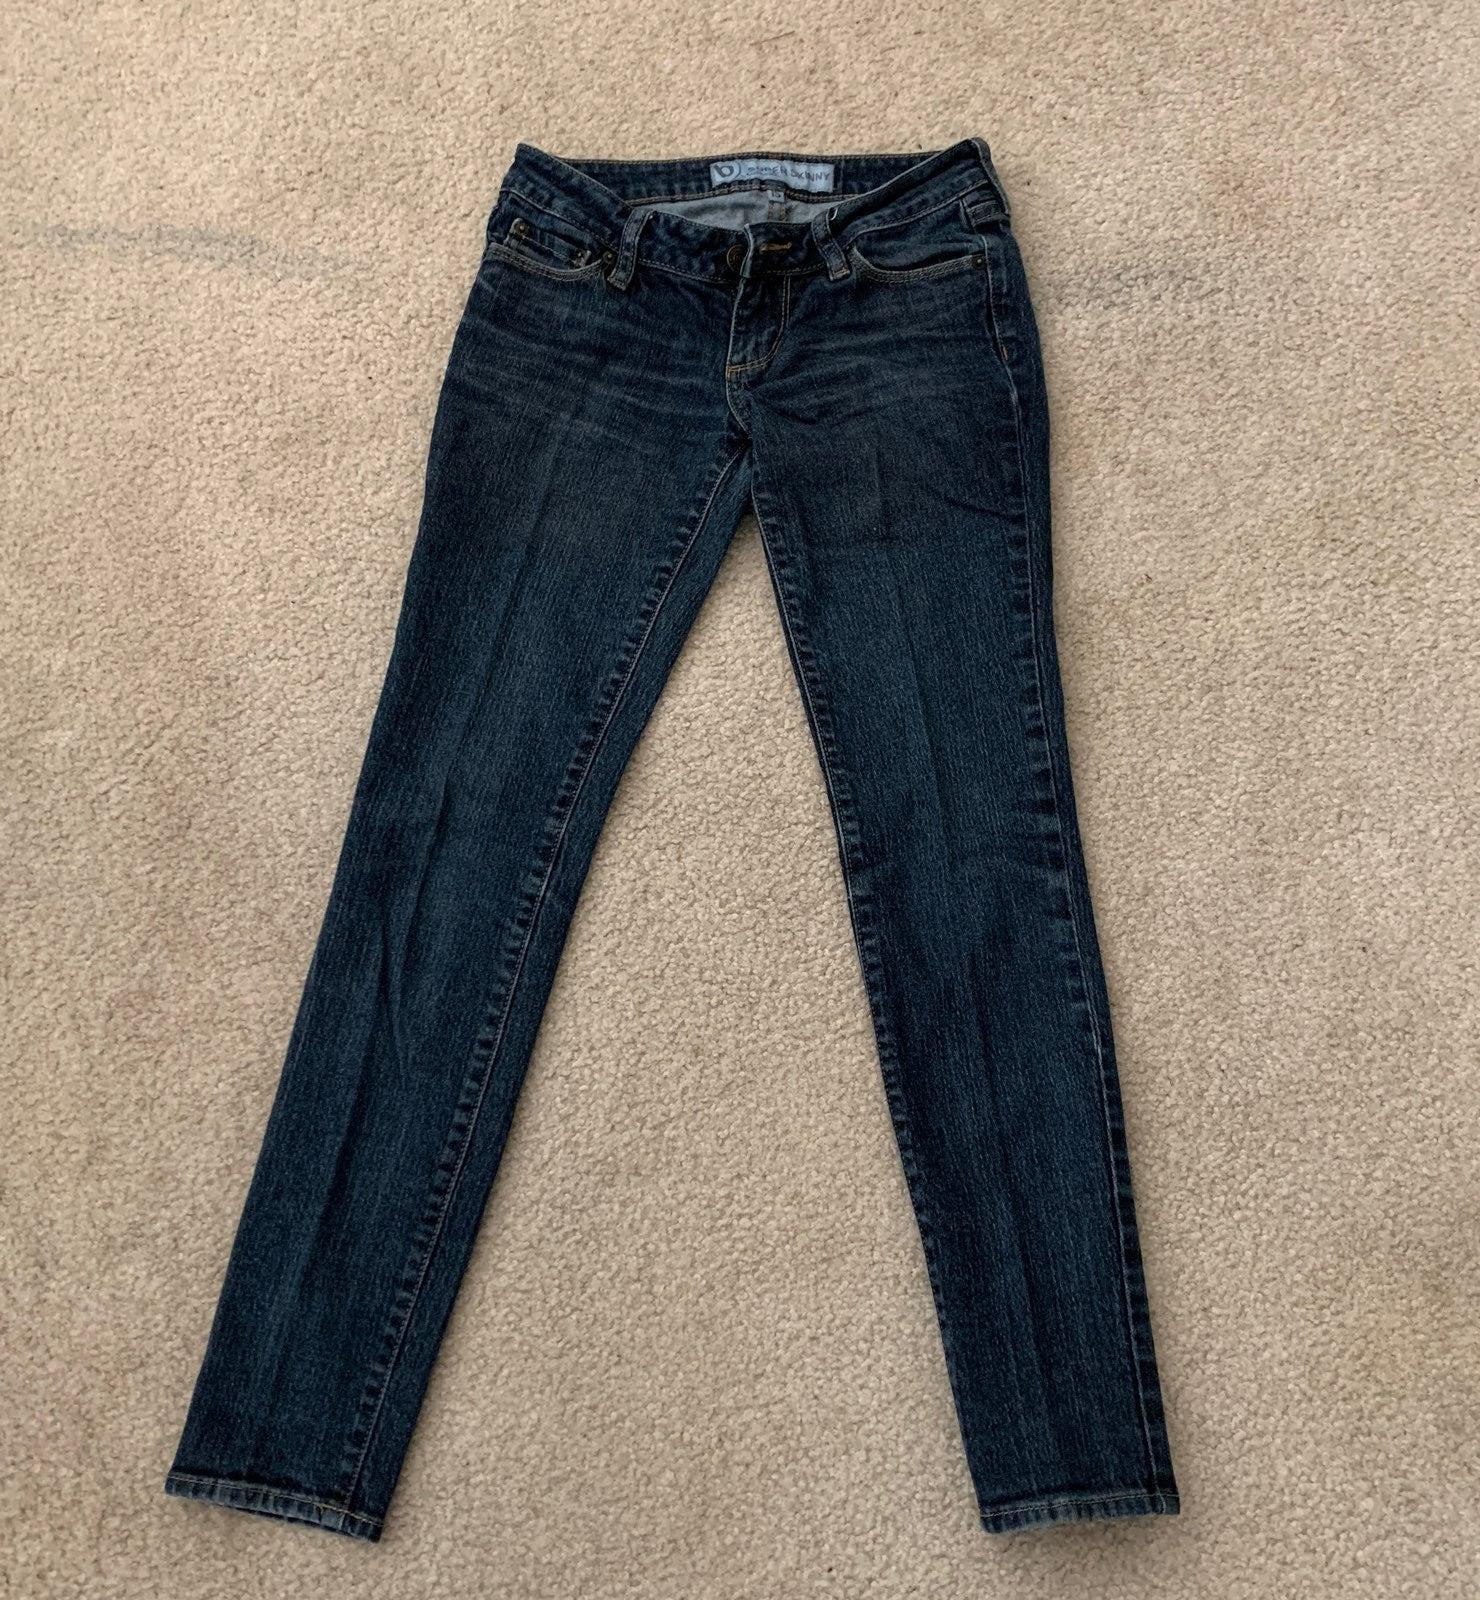 Bullhead Super Skinny Jeans, Size 1S